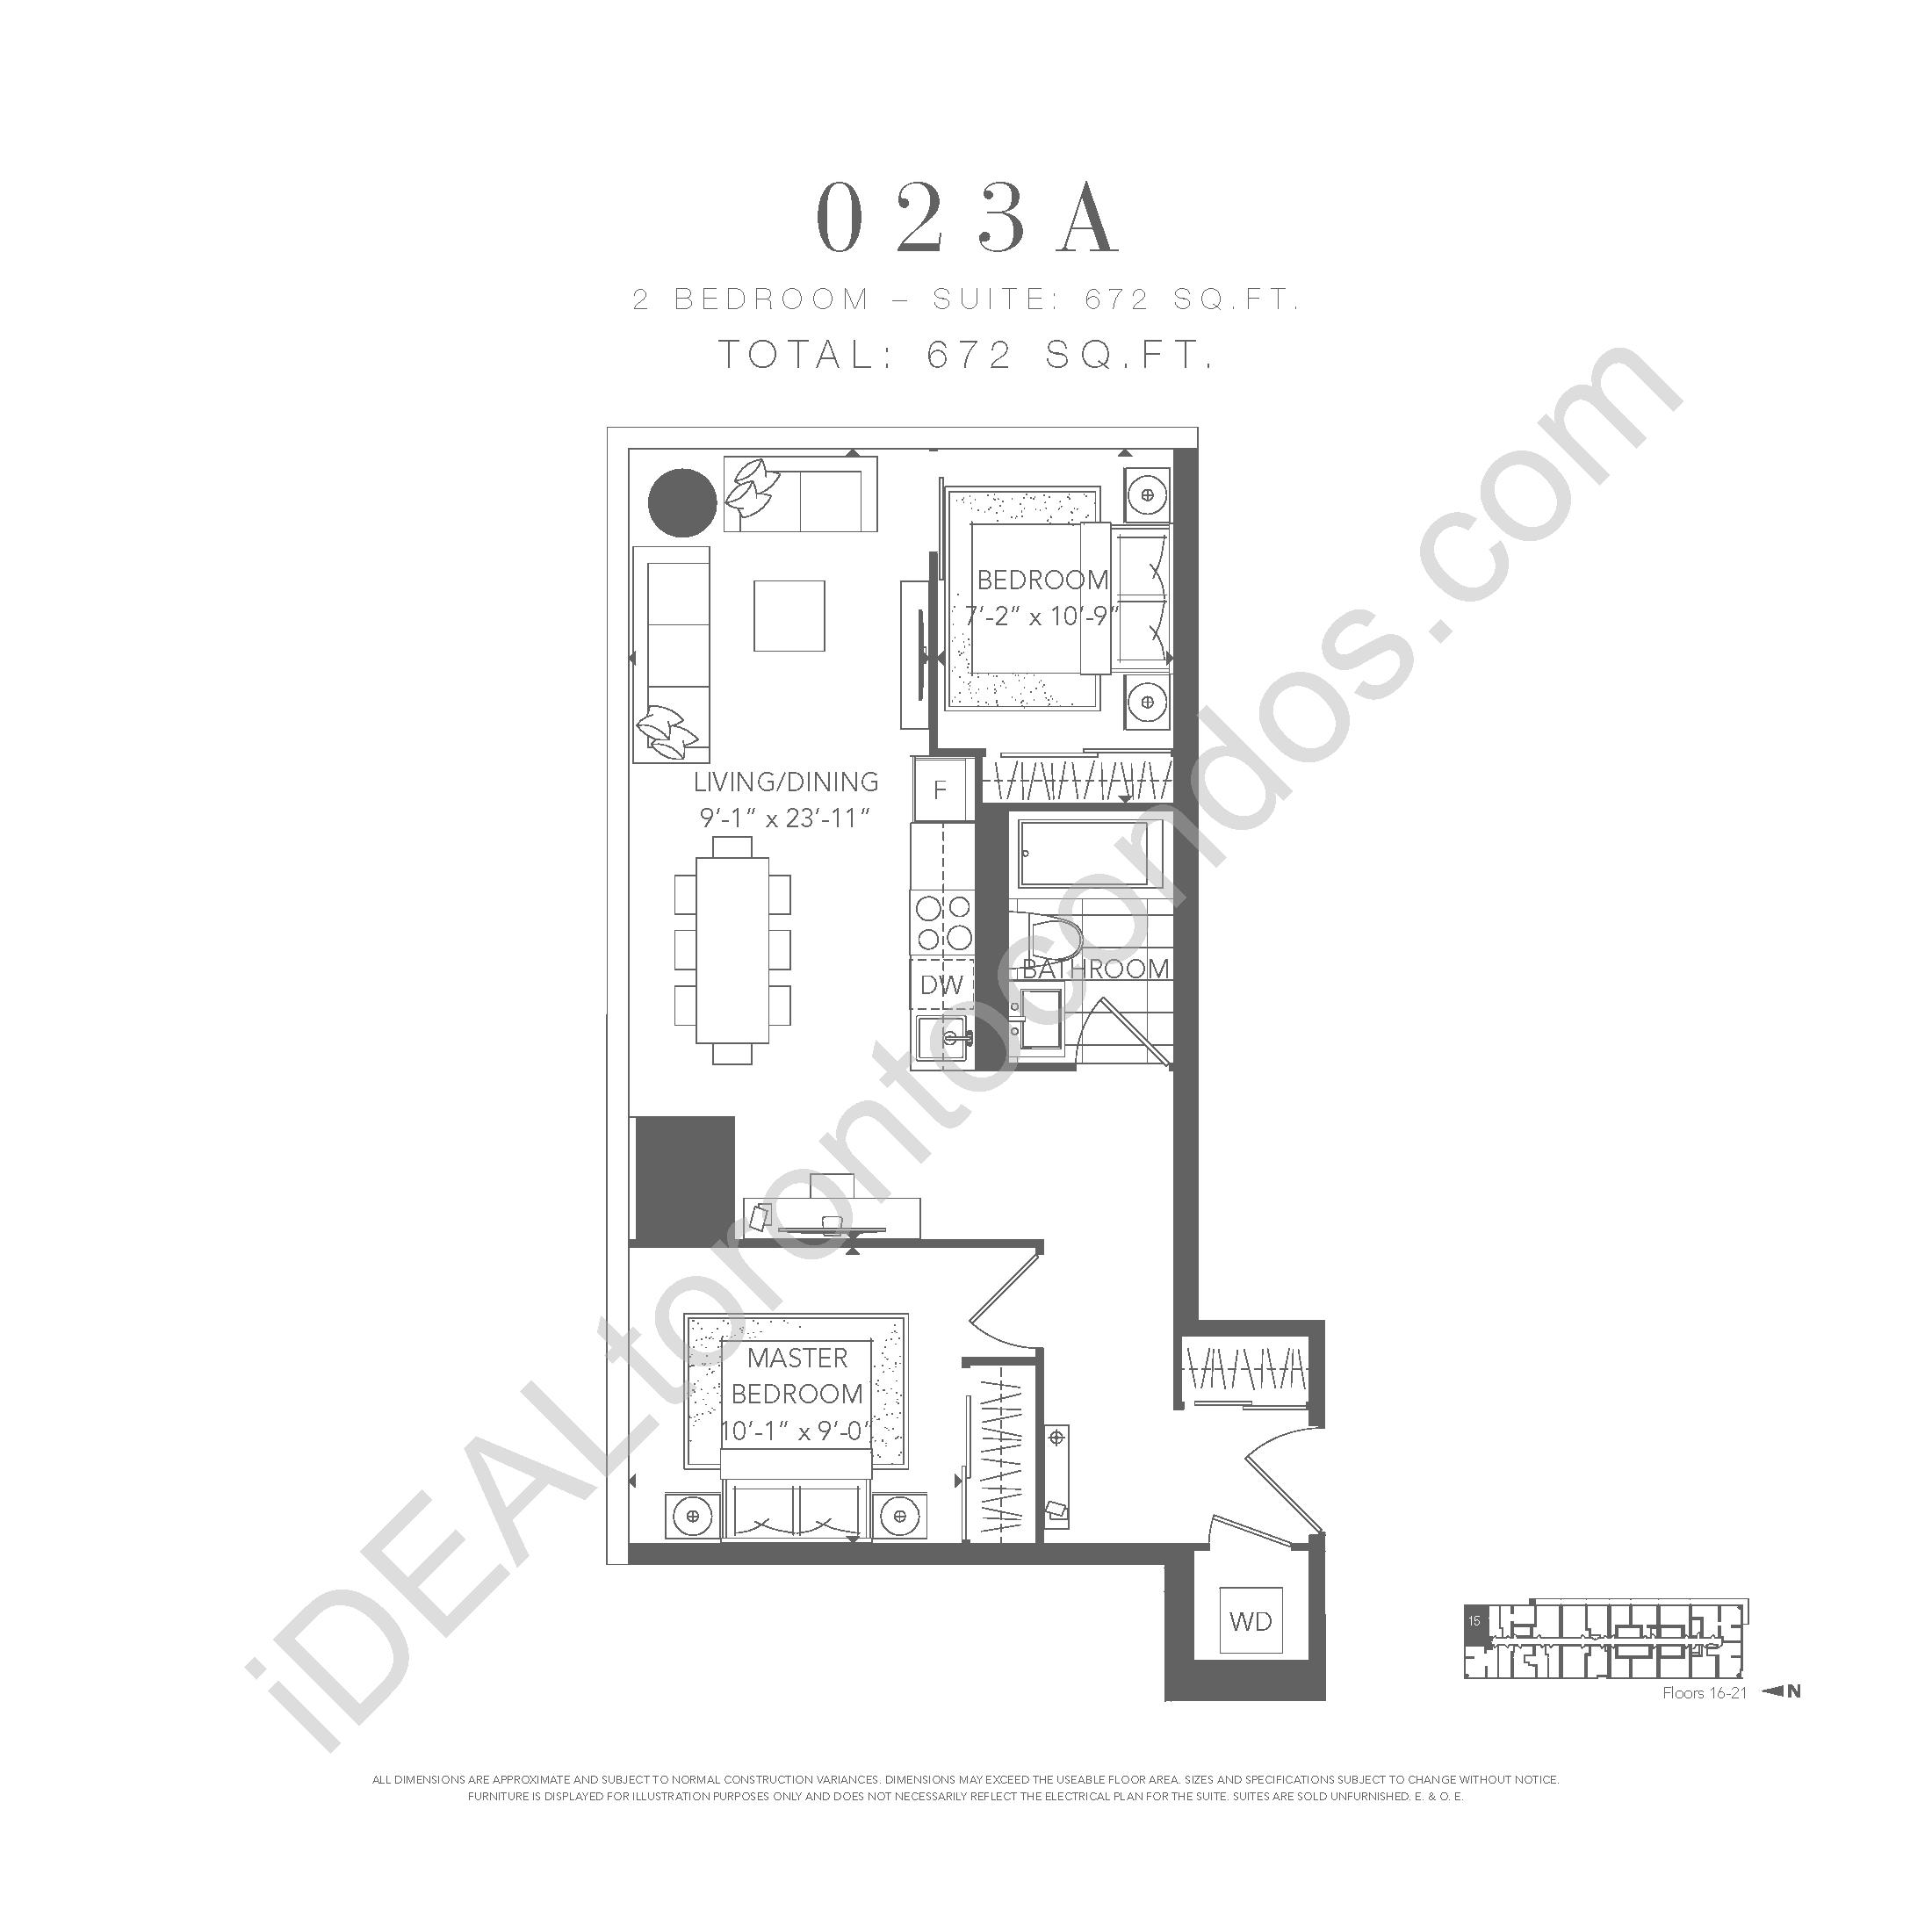 2 bedroom 023 A